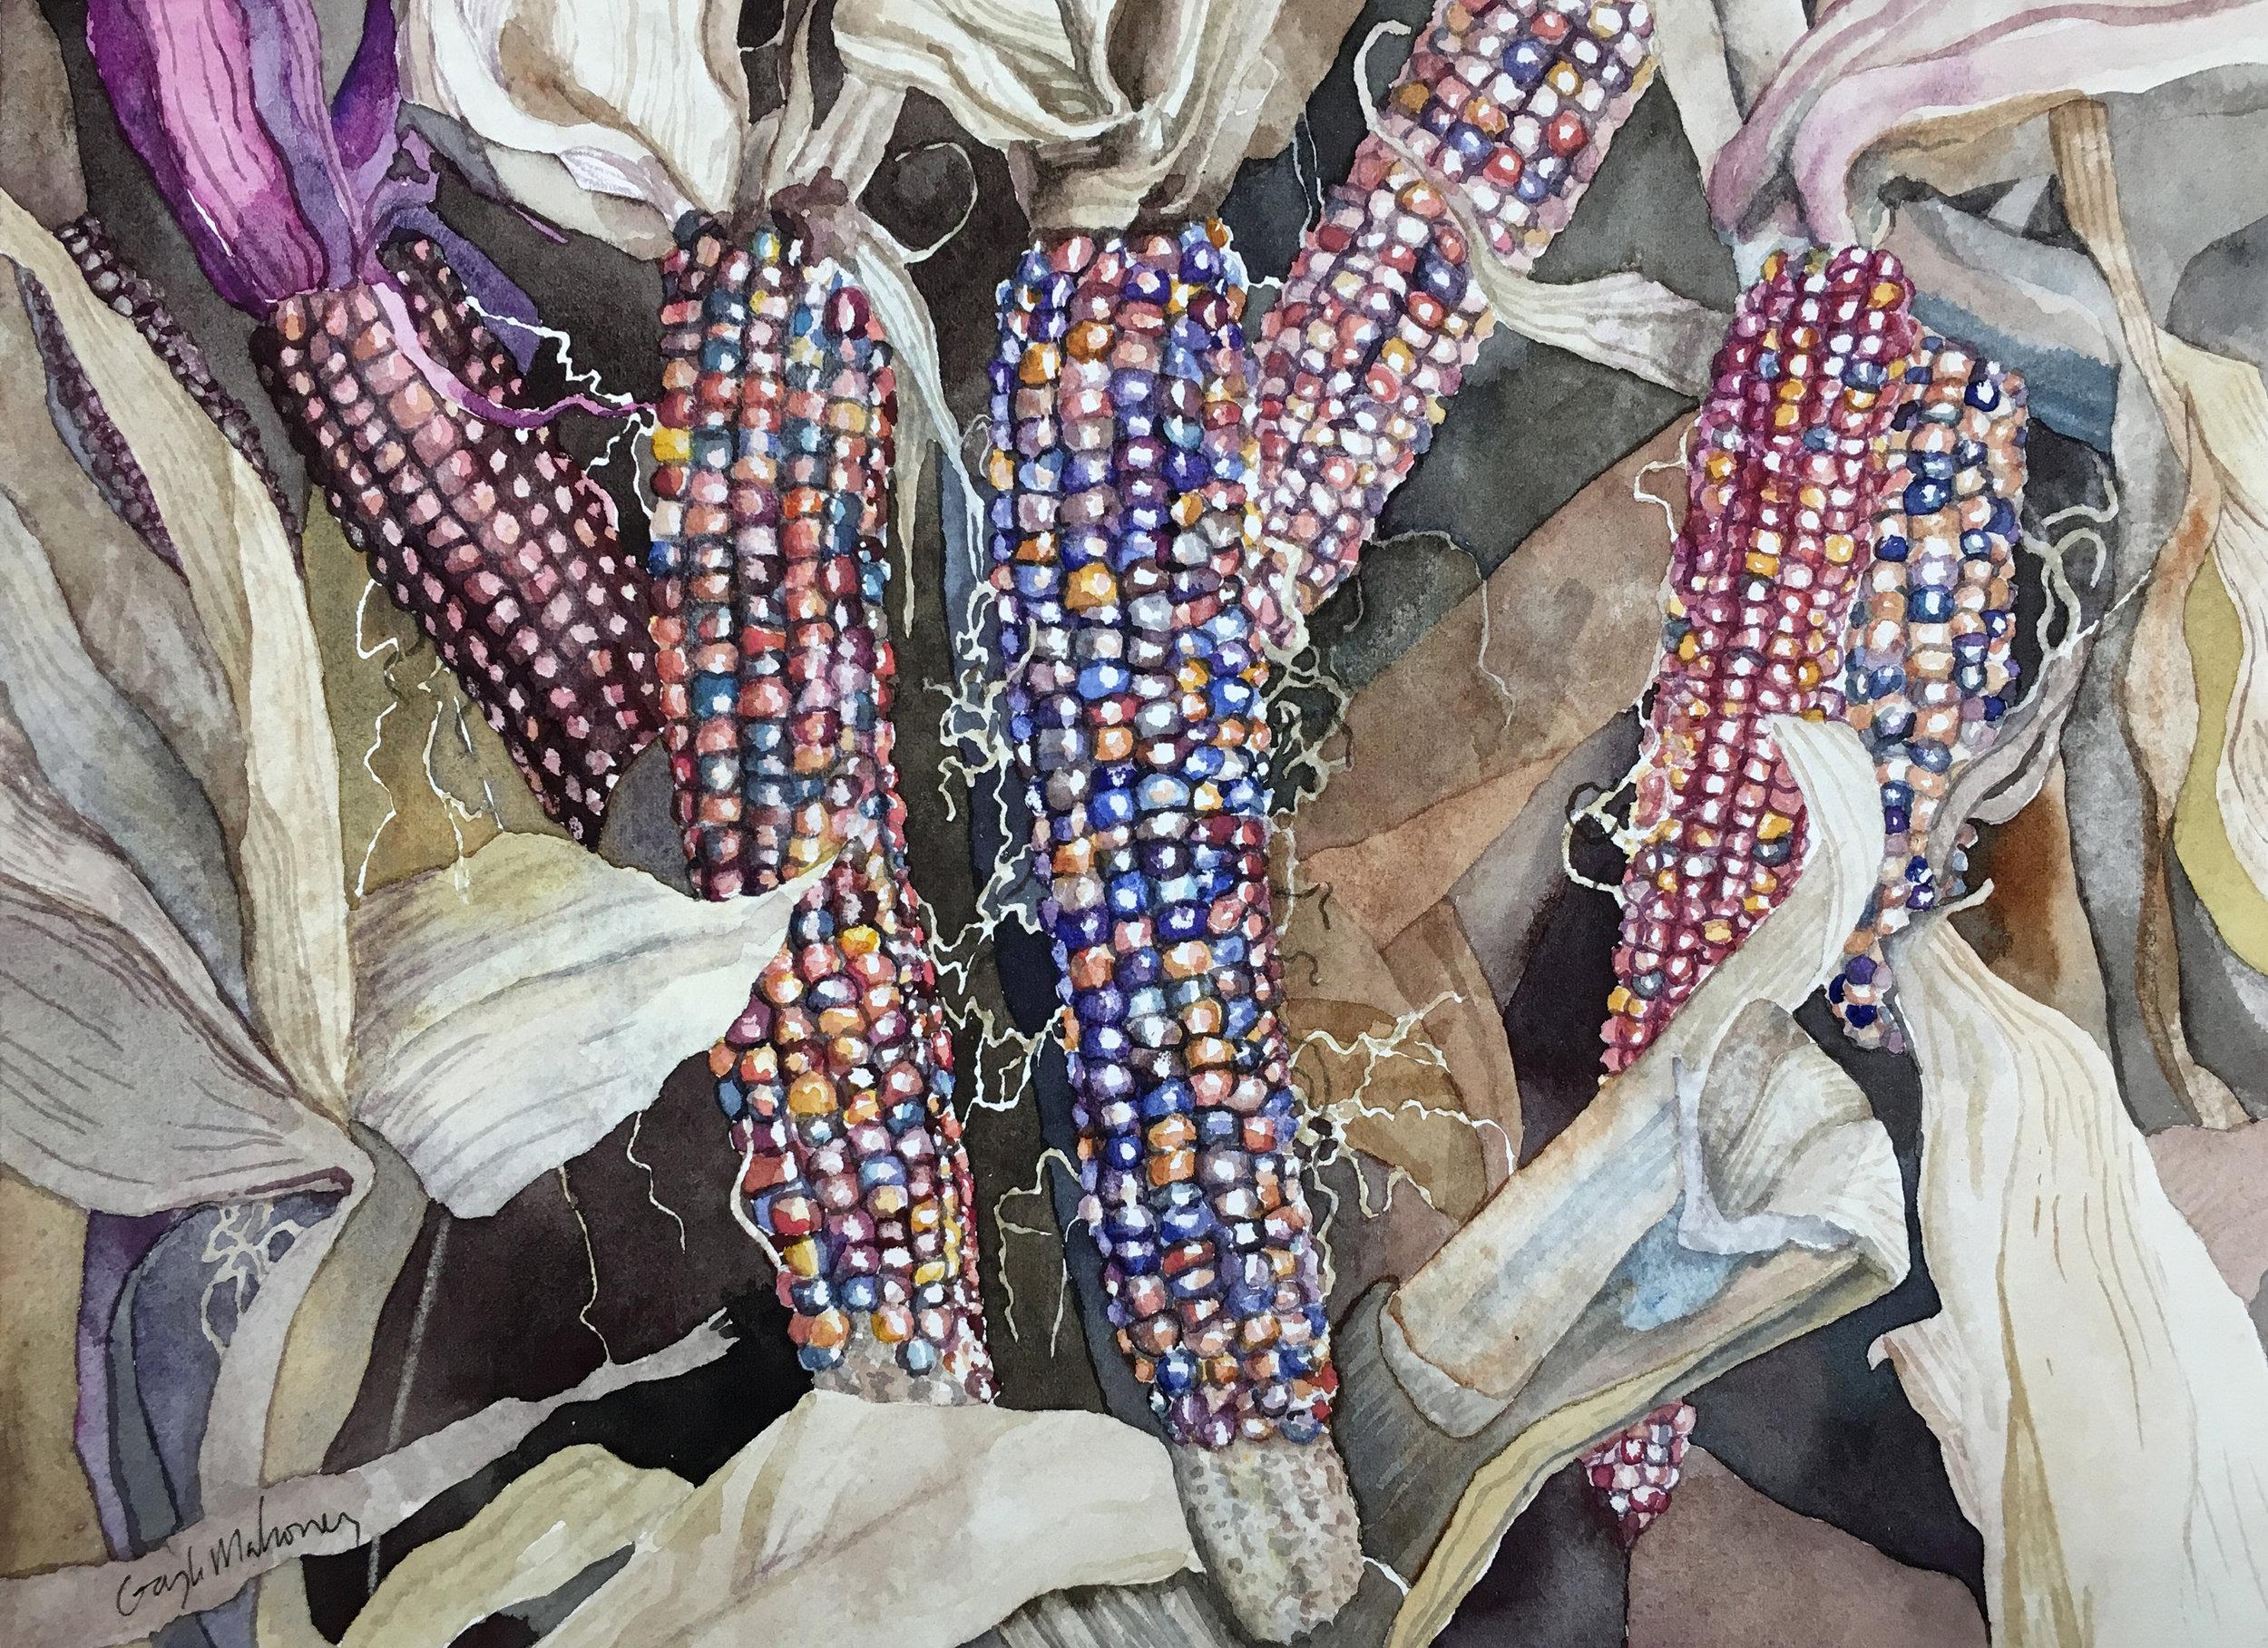 Autumn Corn , watercolor on Fabriano Artistico cold pressed paper, ©Gayle Mahoney